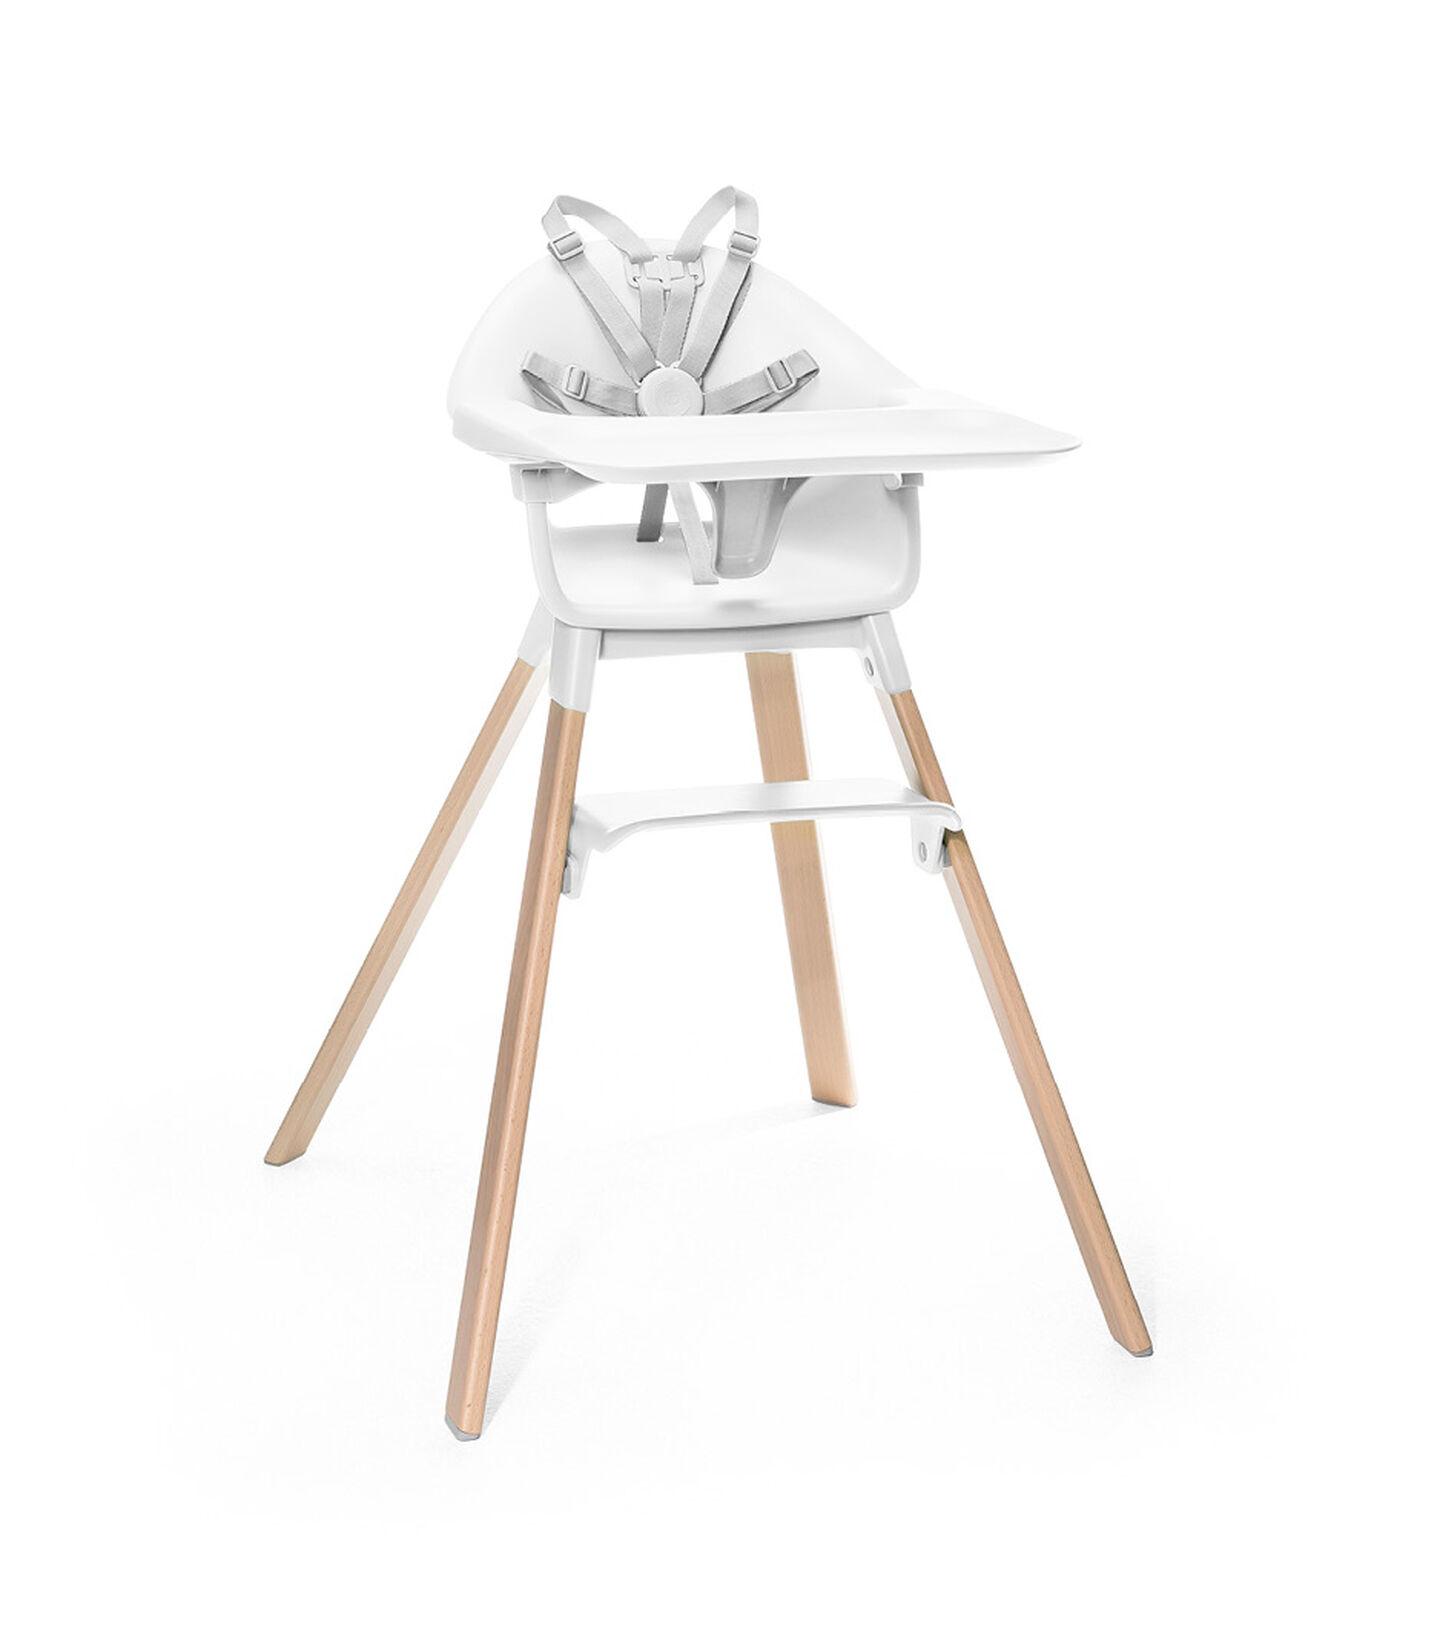 Stokke® Clikk™ High Chair White, White, mainview view 2